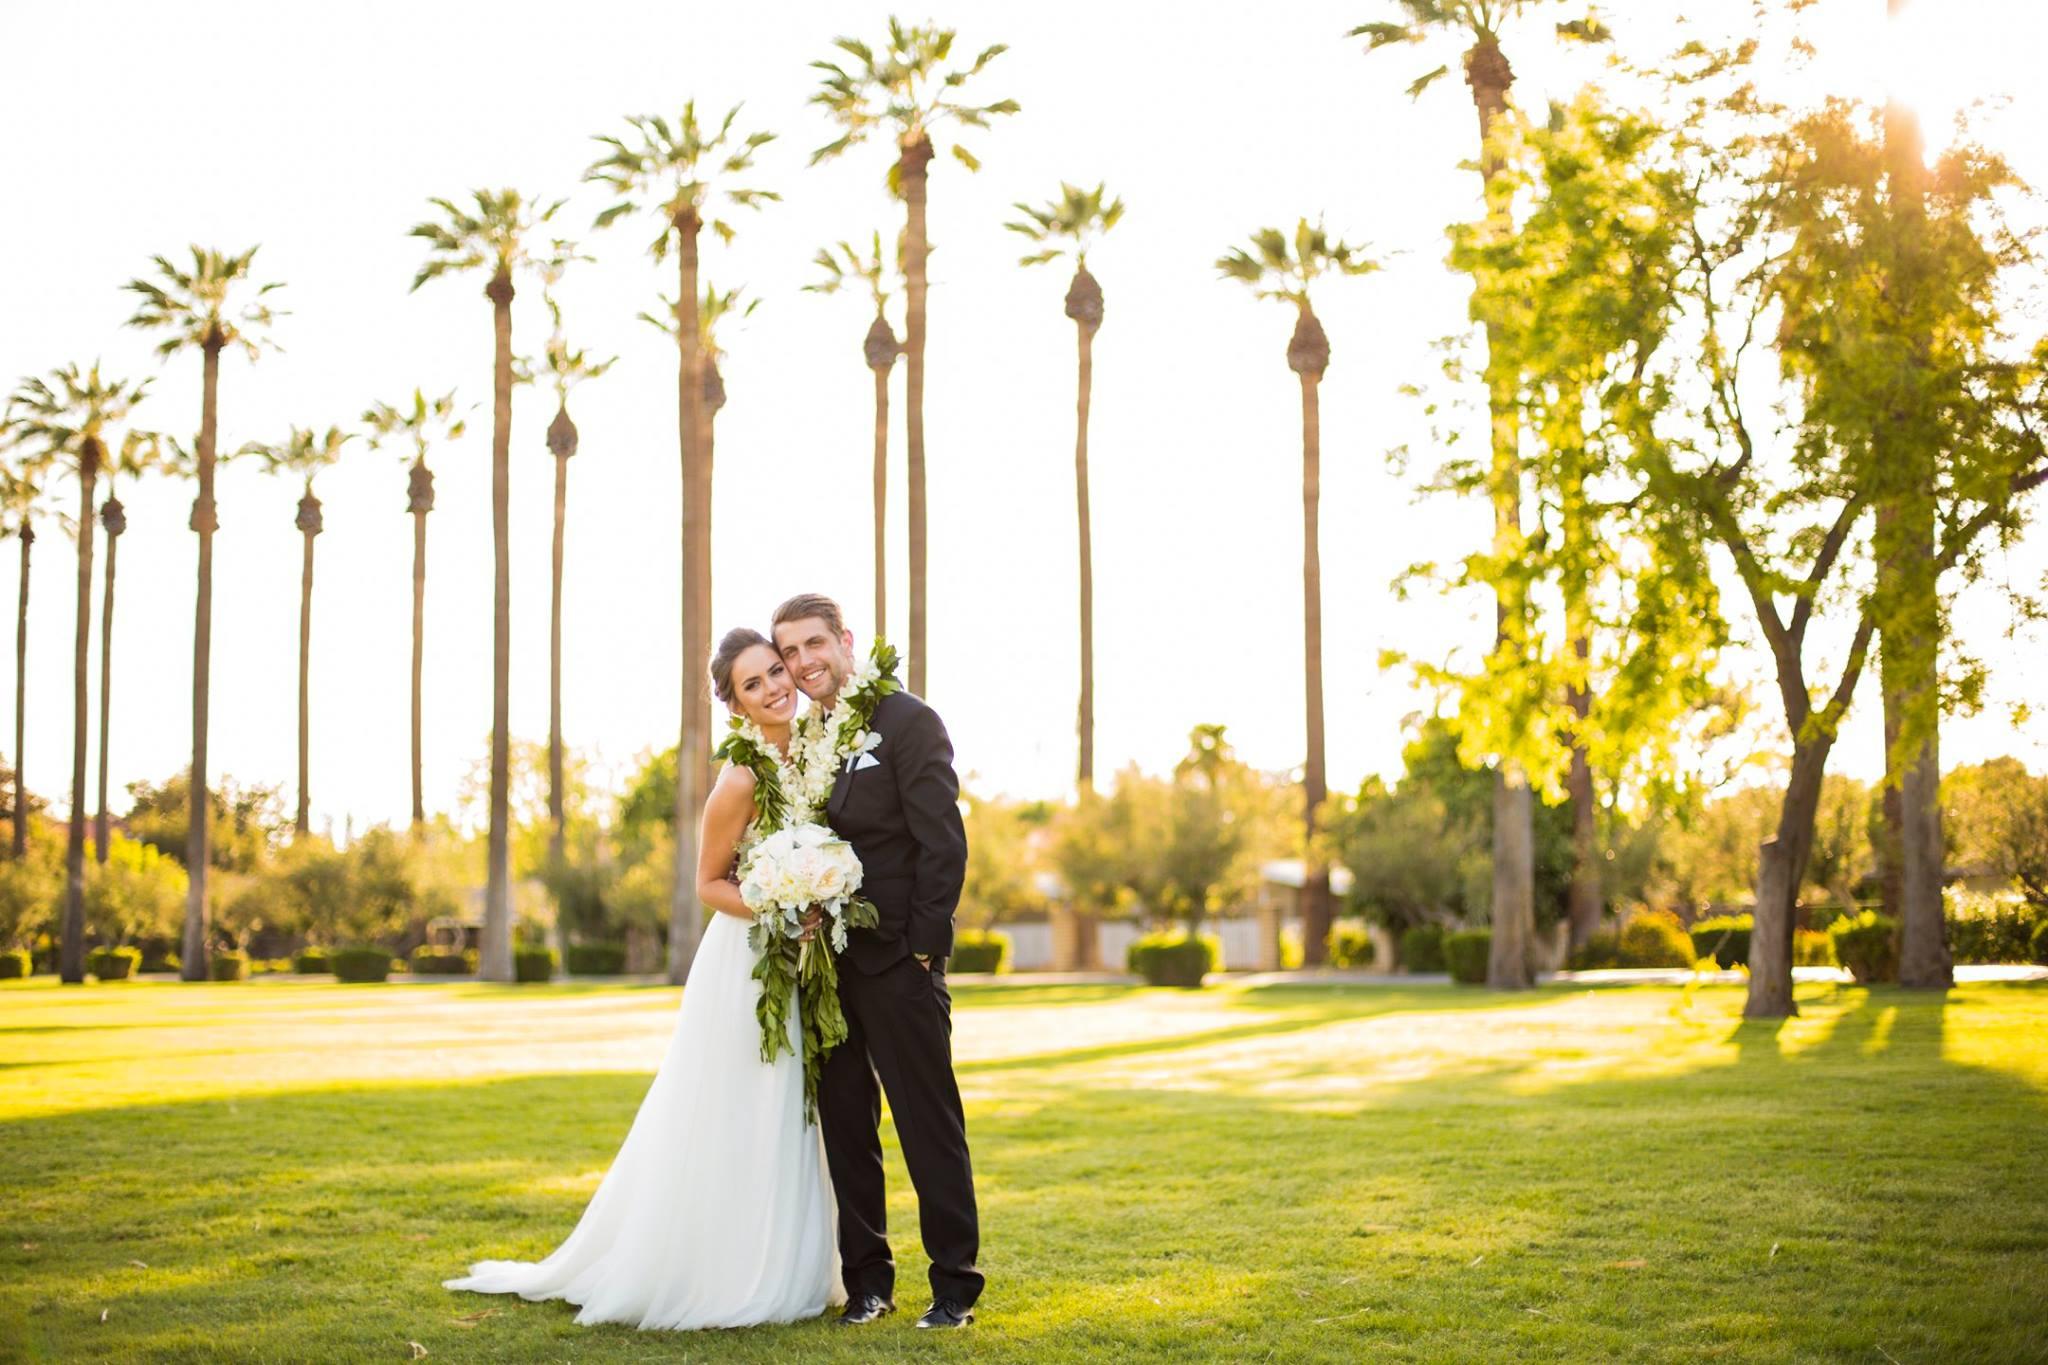 Otten Wedding Stockdale Country Club Bakersfield